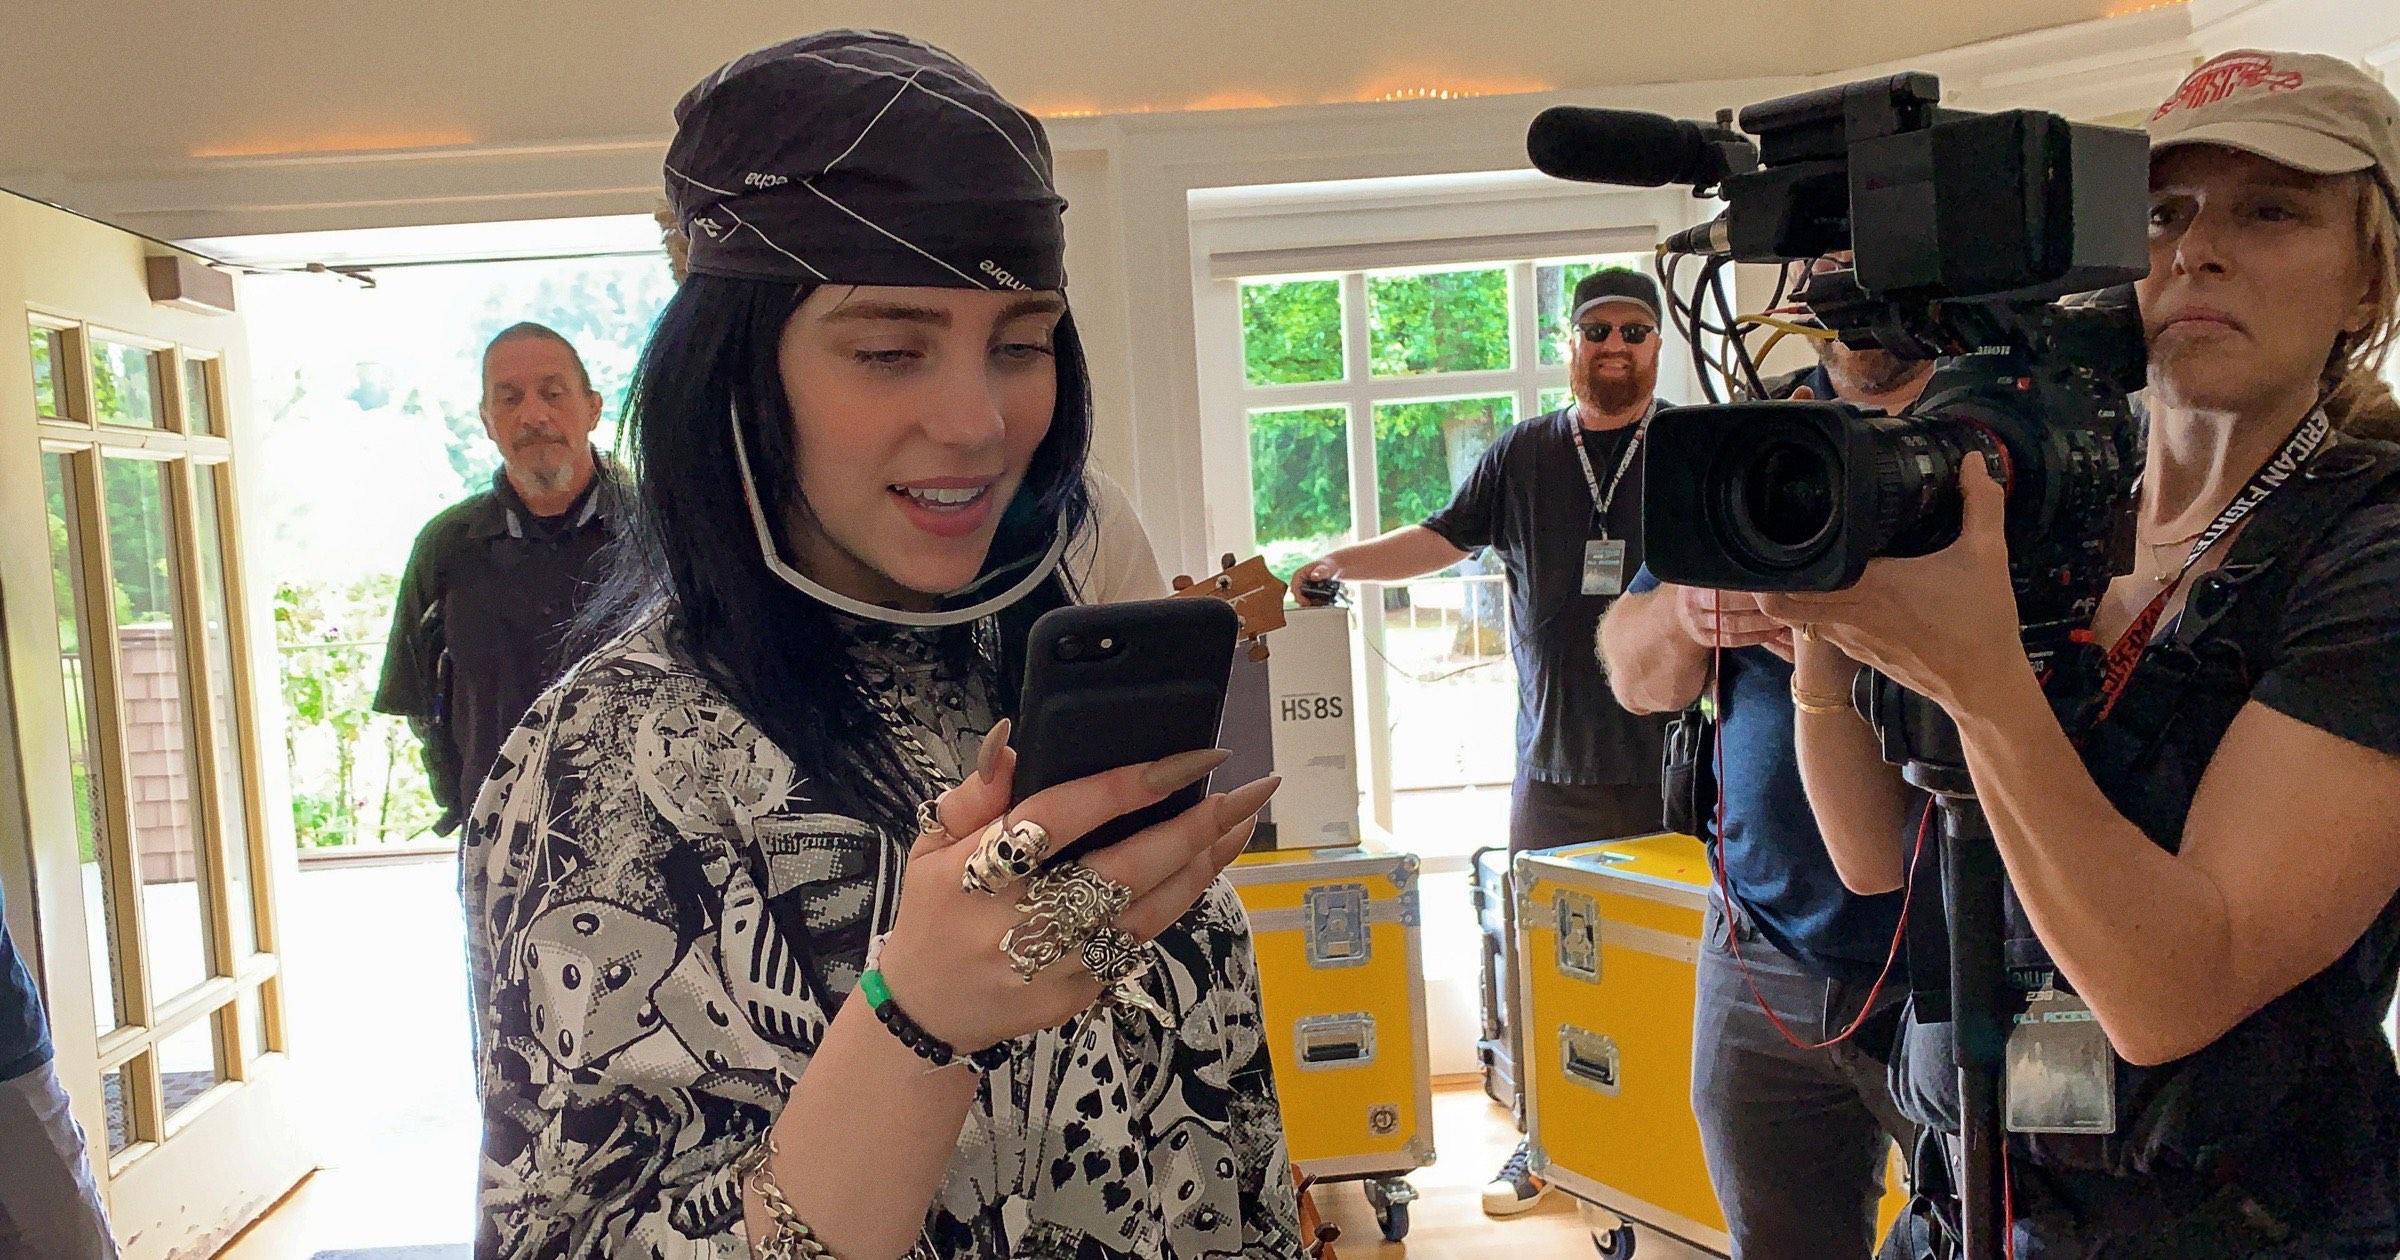 Billie eilish in documentary Apple TV+